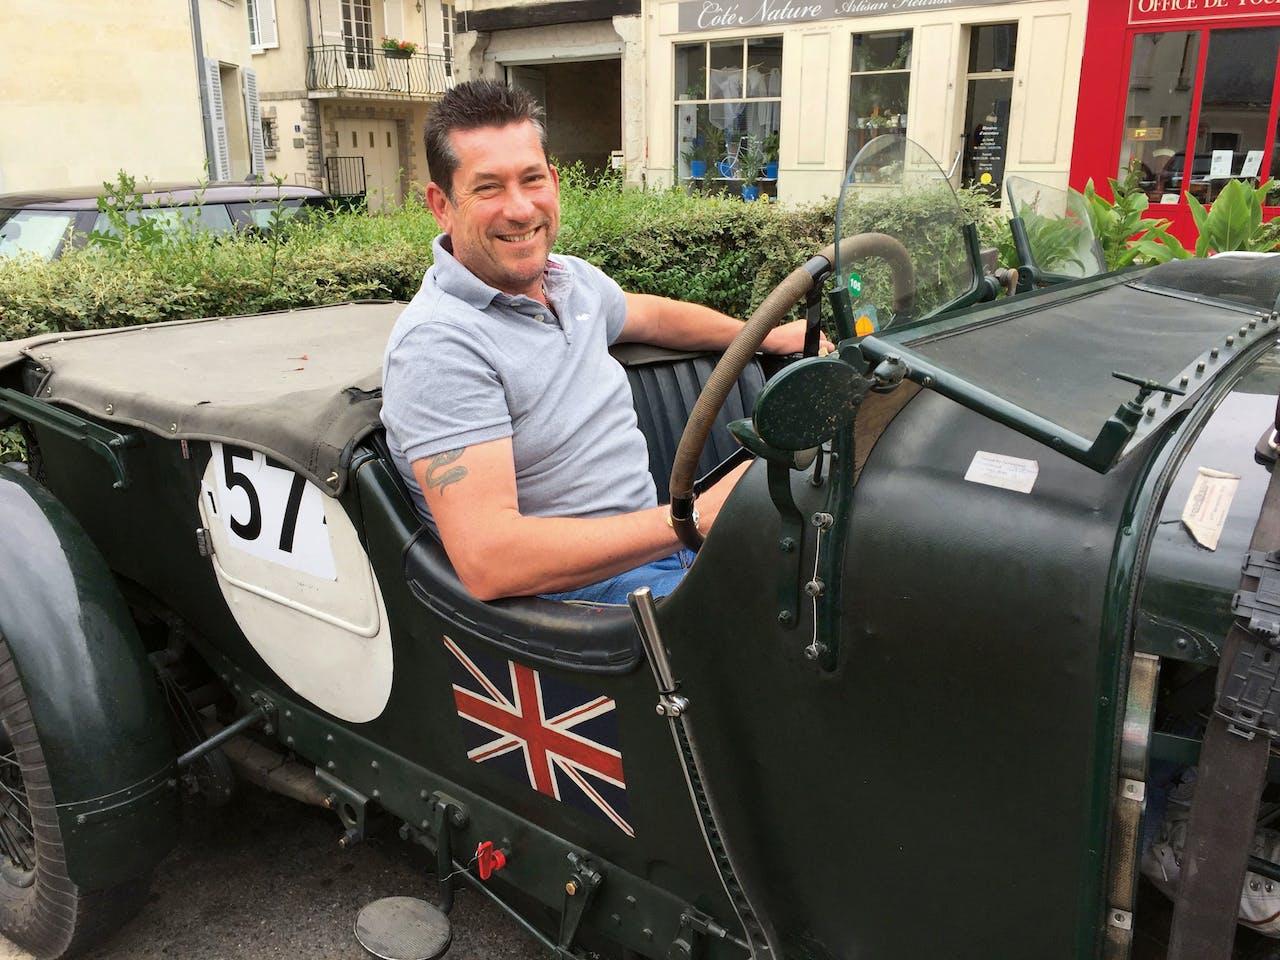 De Britse ondernemer Martin Overington, die het hotel kocht.